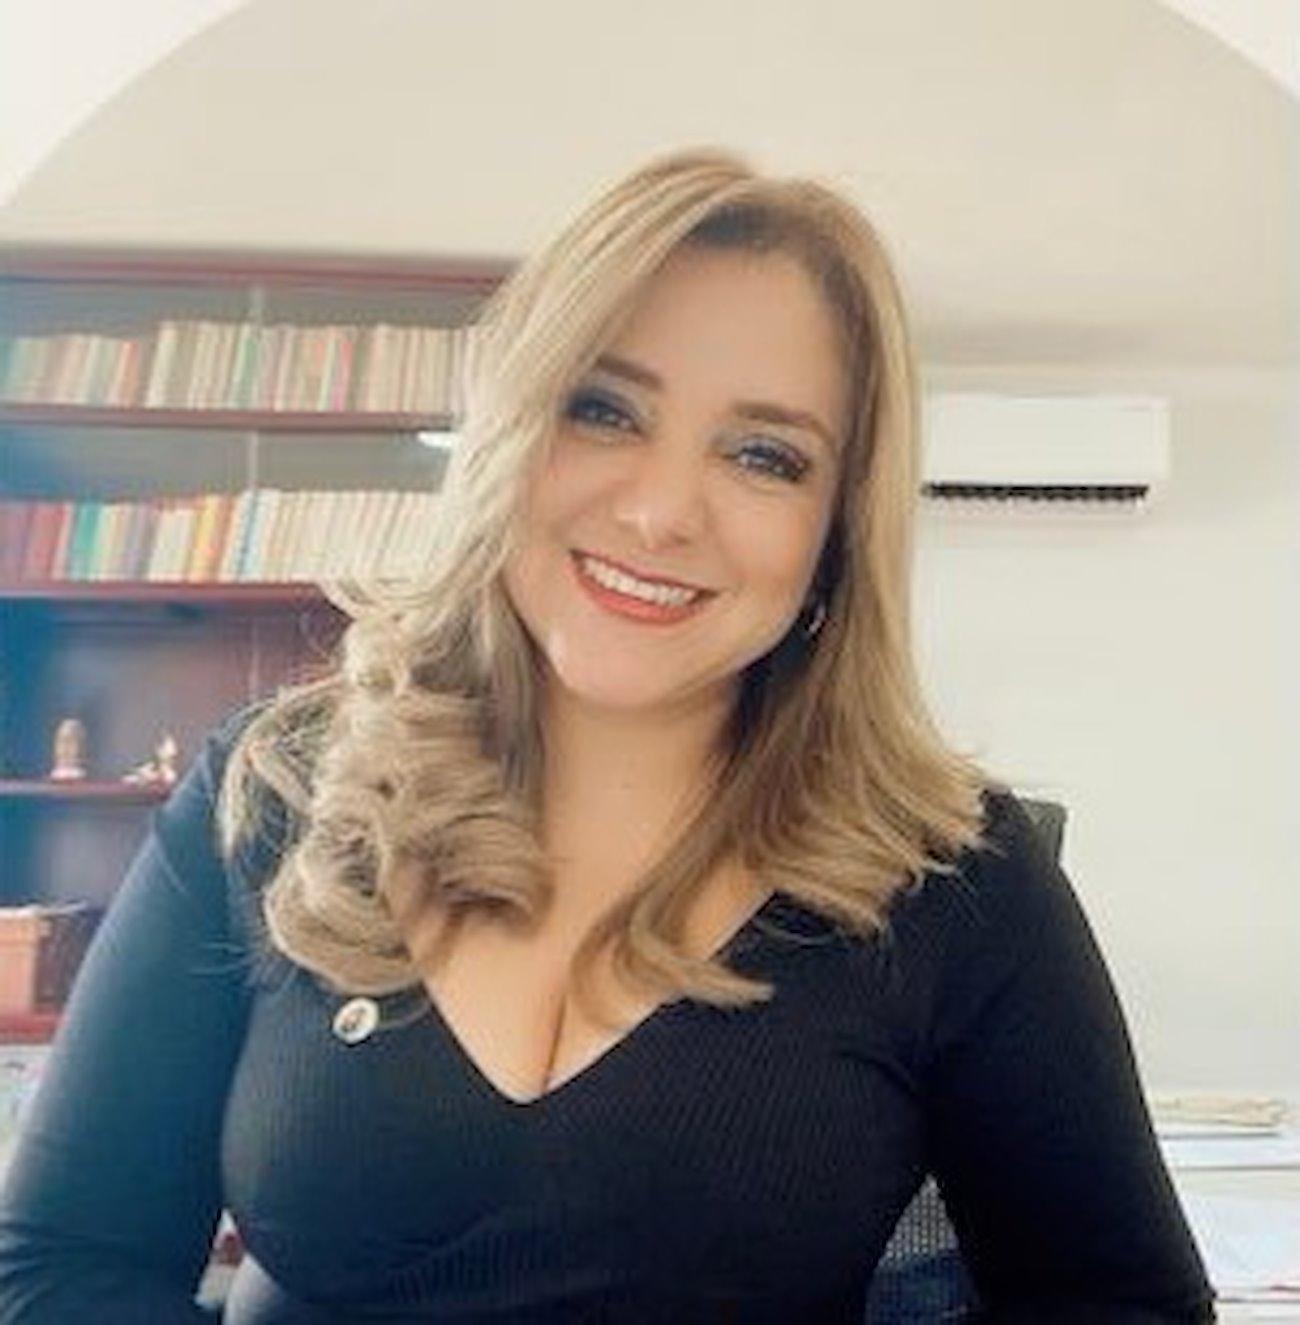 Magda Paola Gutiérrez Vanegas, Registrar, SNR's Registration Office for Public Records in Chaparral